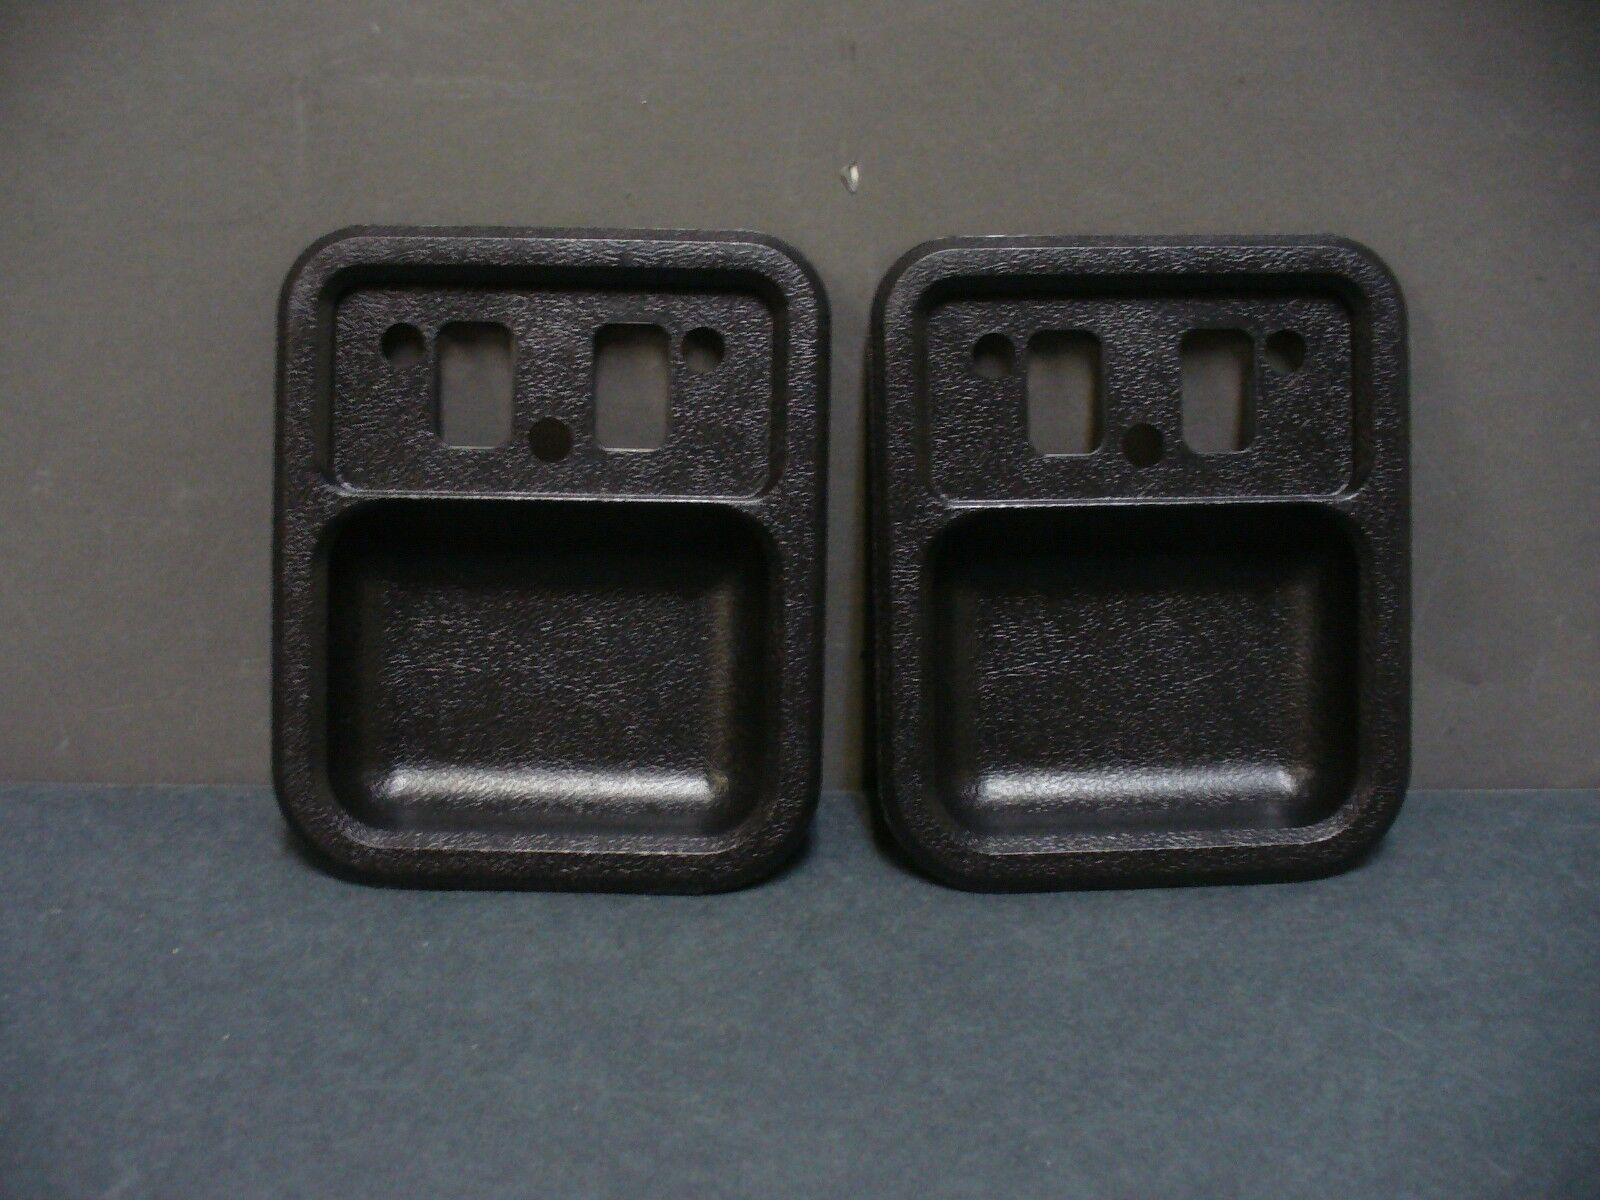 68 69 Ford Torino Falcon Fairlane door handle cups black 68 Gaaxie Econoline